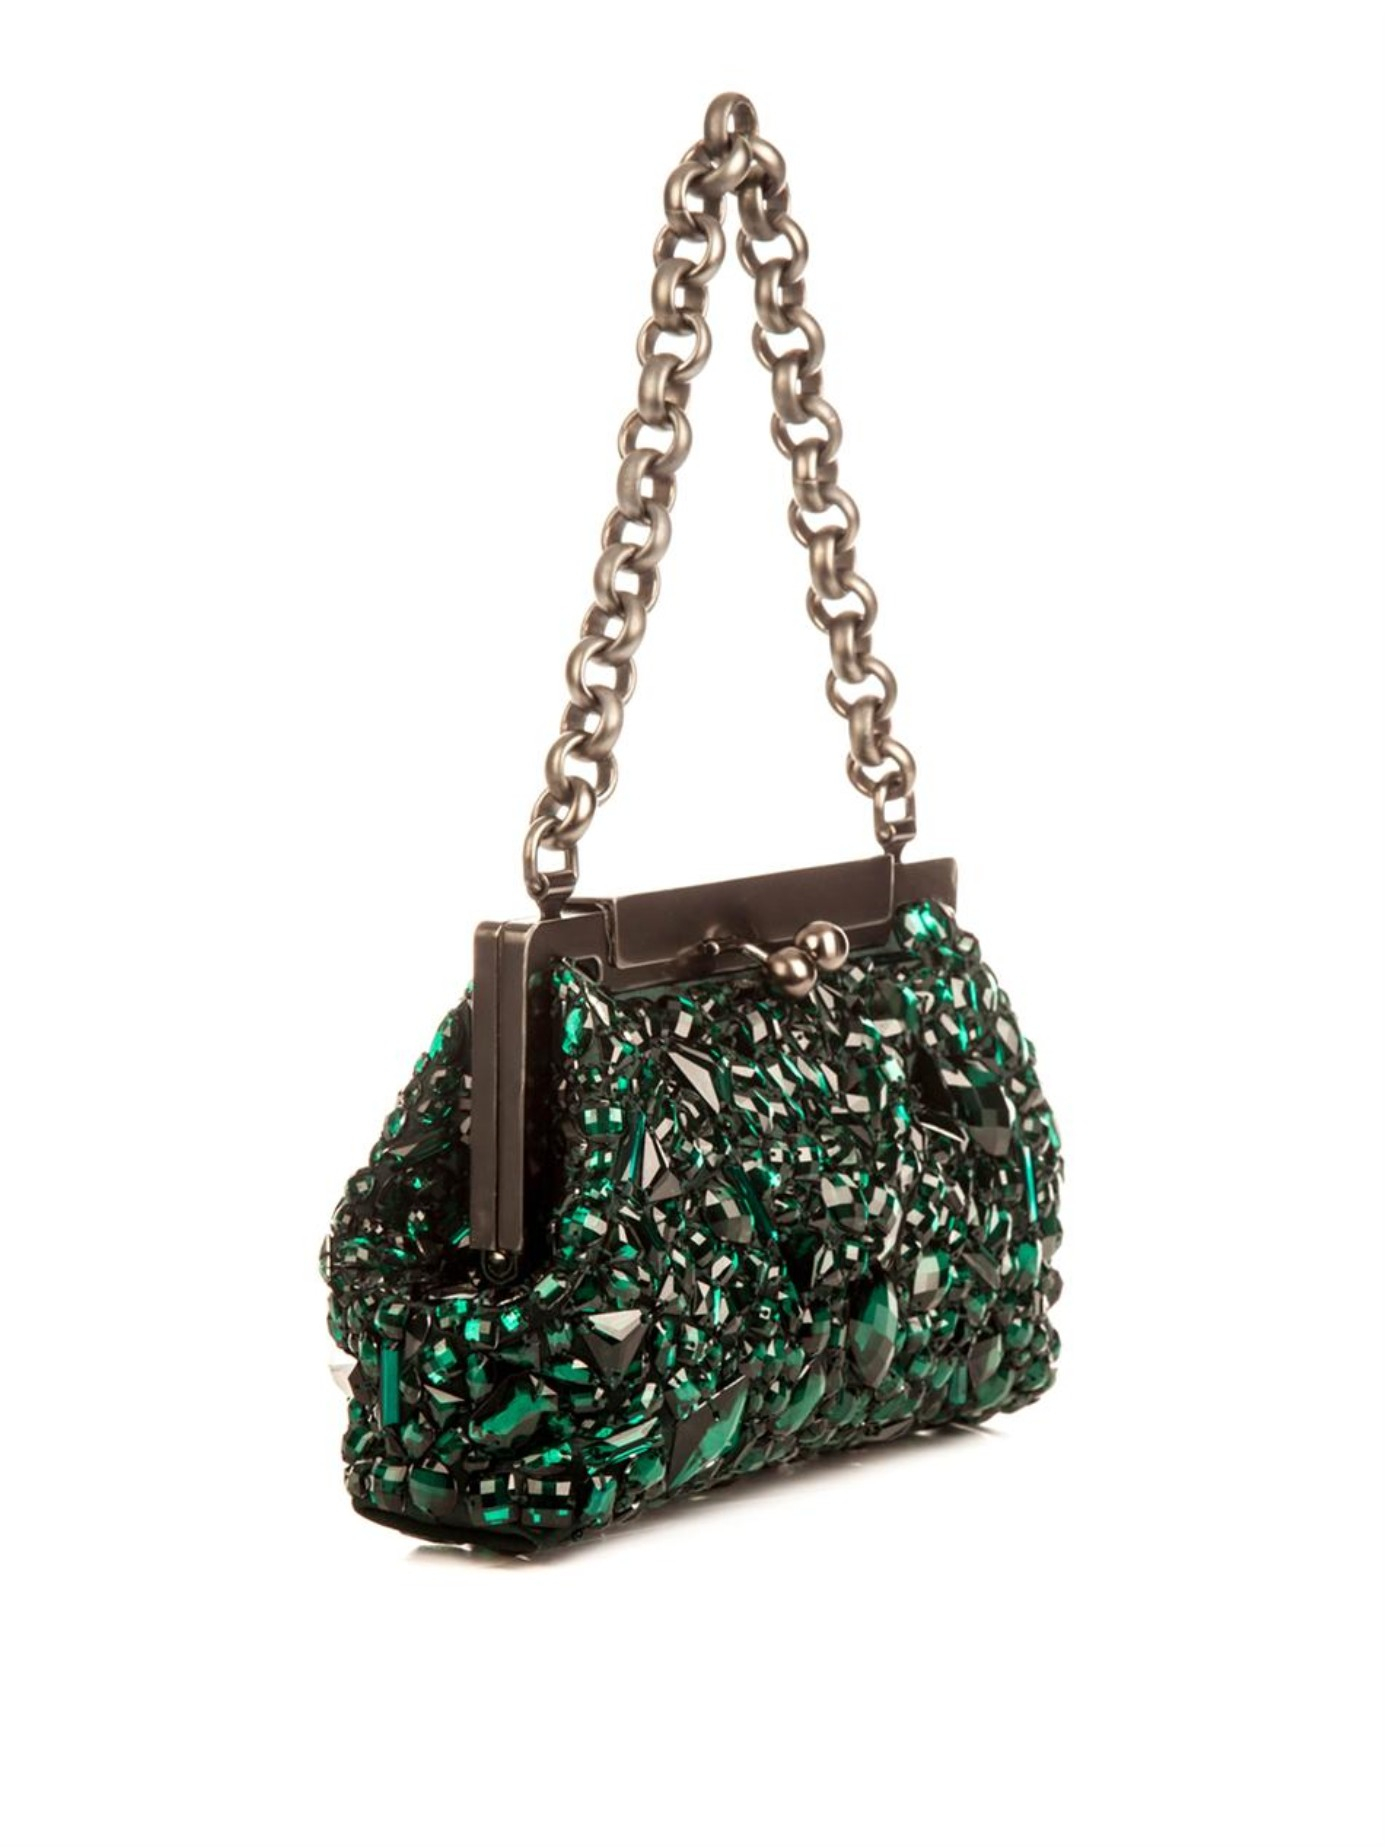 Lyst - Dolce   Gabbana Sara Crystal-Embellished Bag in Green 443673e4dbea8